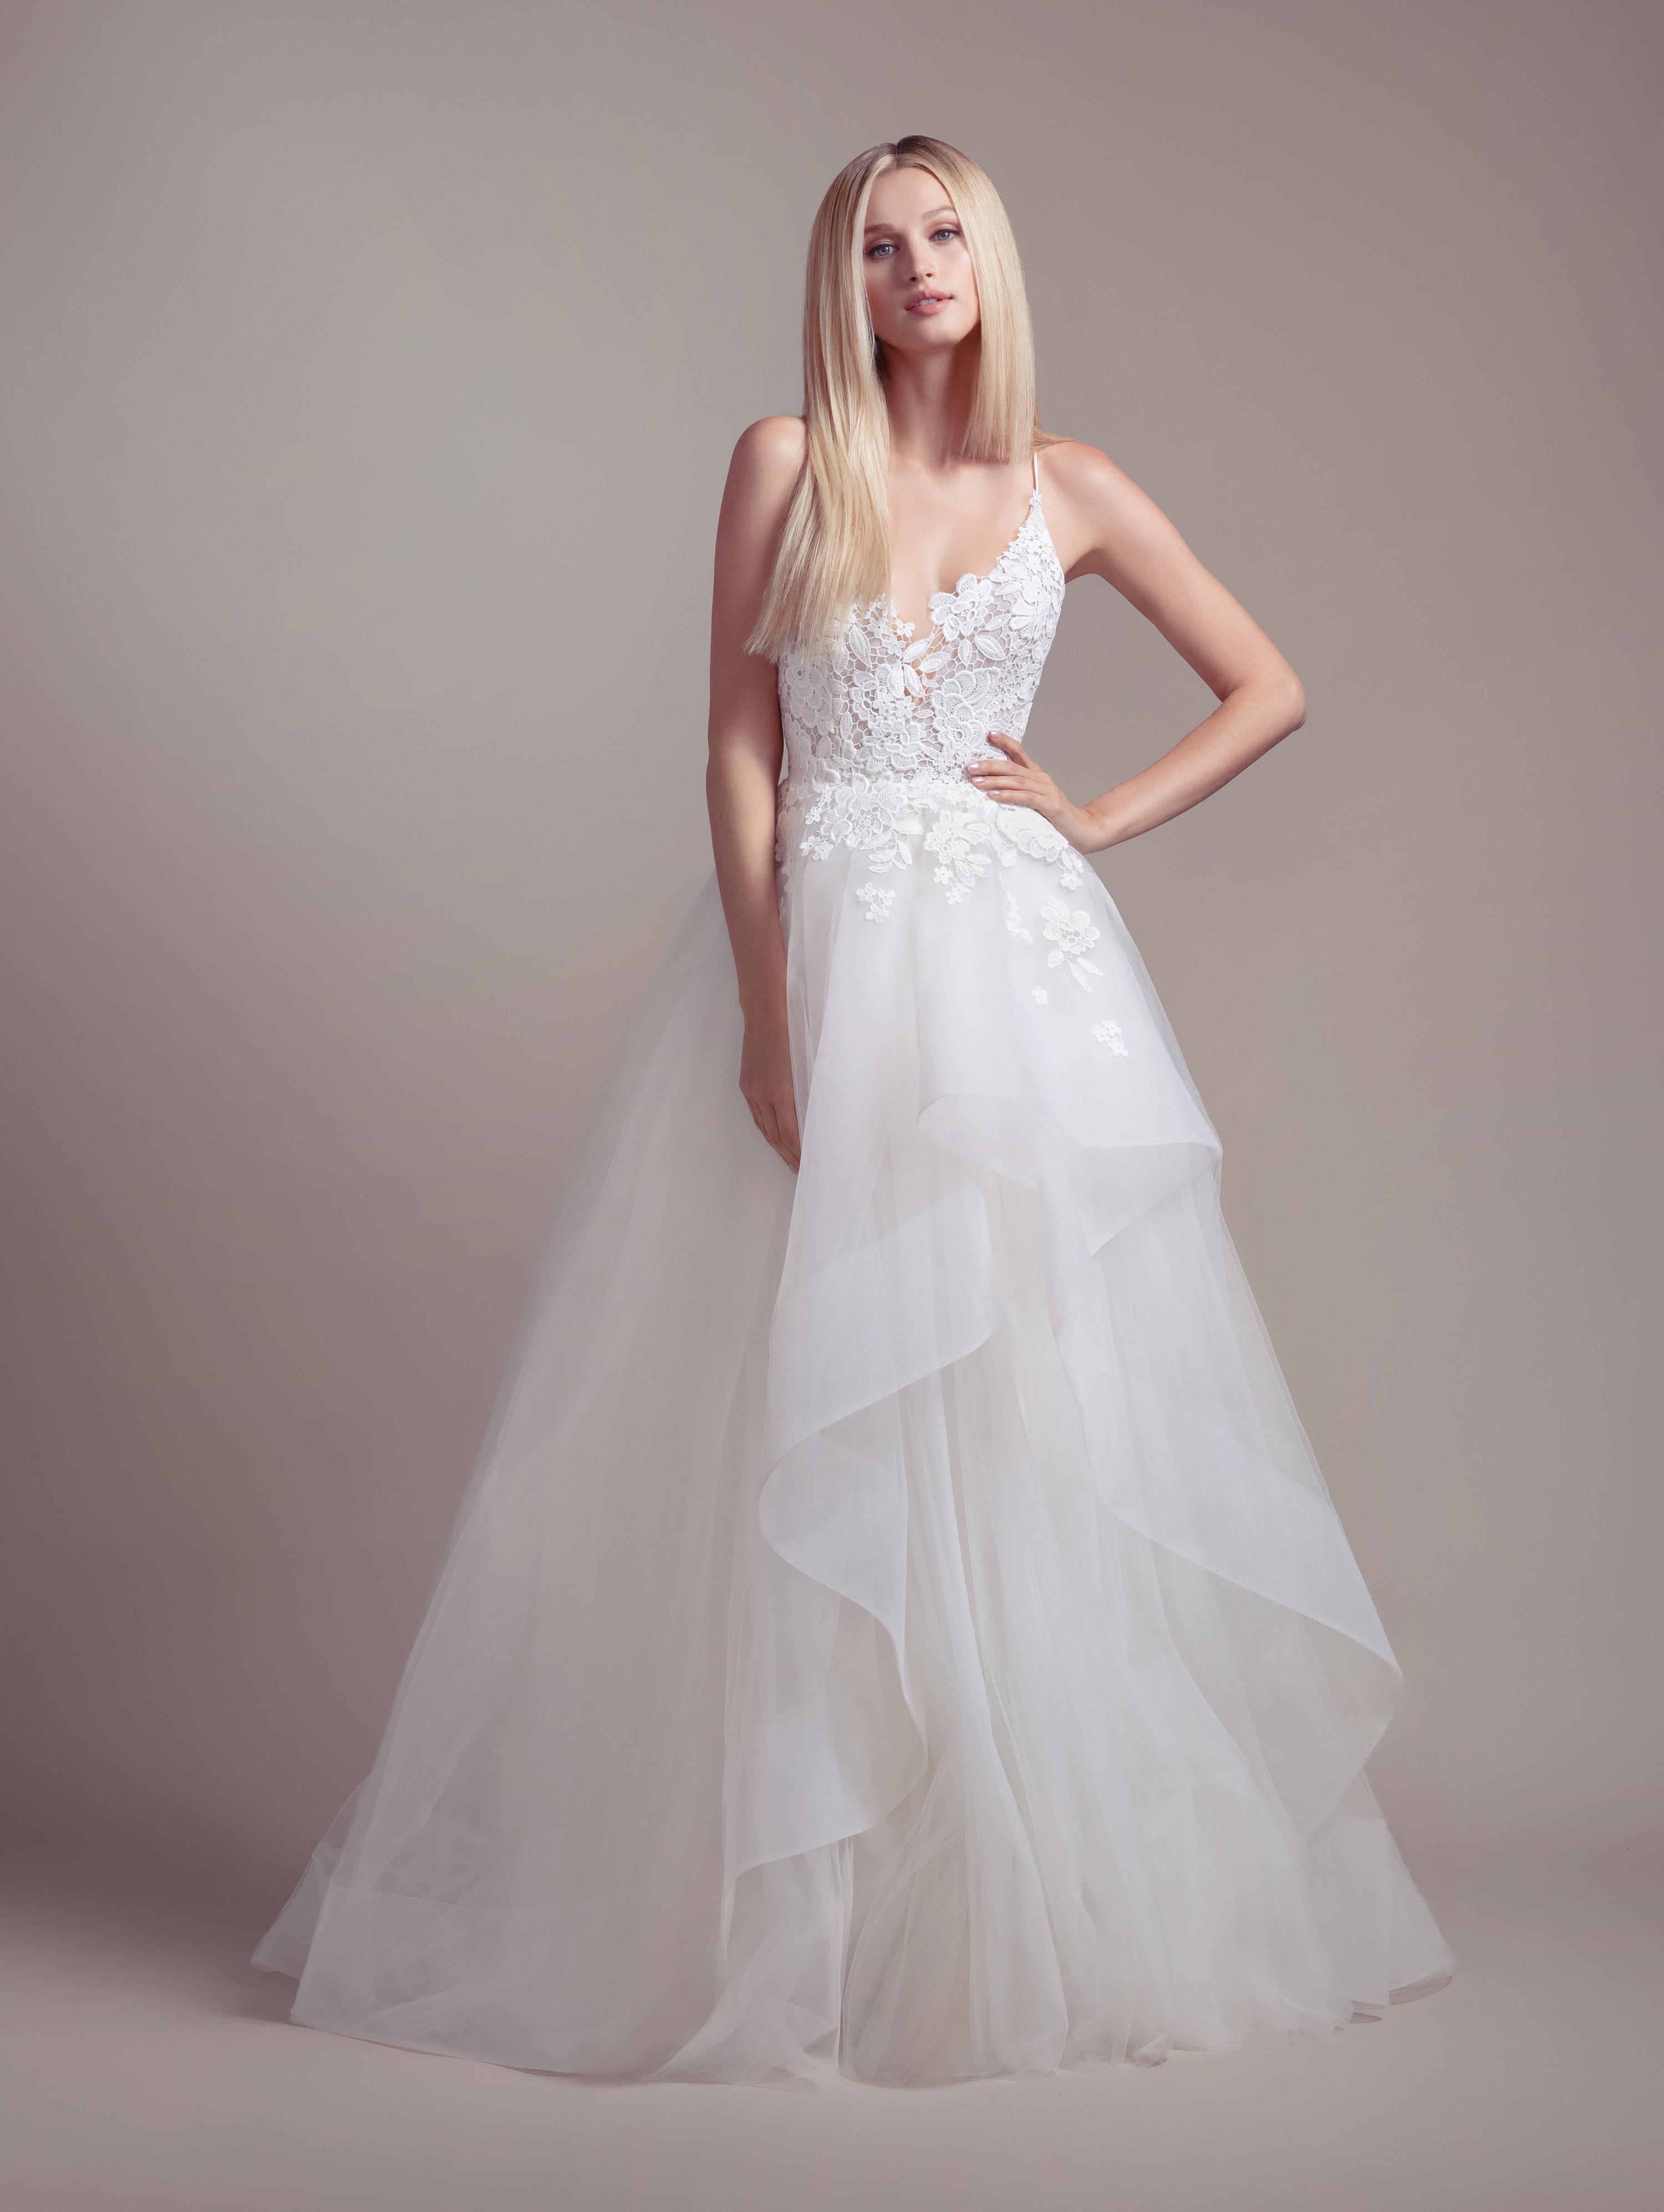 Lace Bodice Spaghetti Strap Ball Gown Wedding Dress